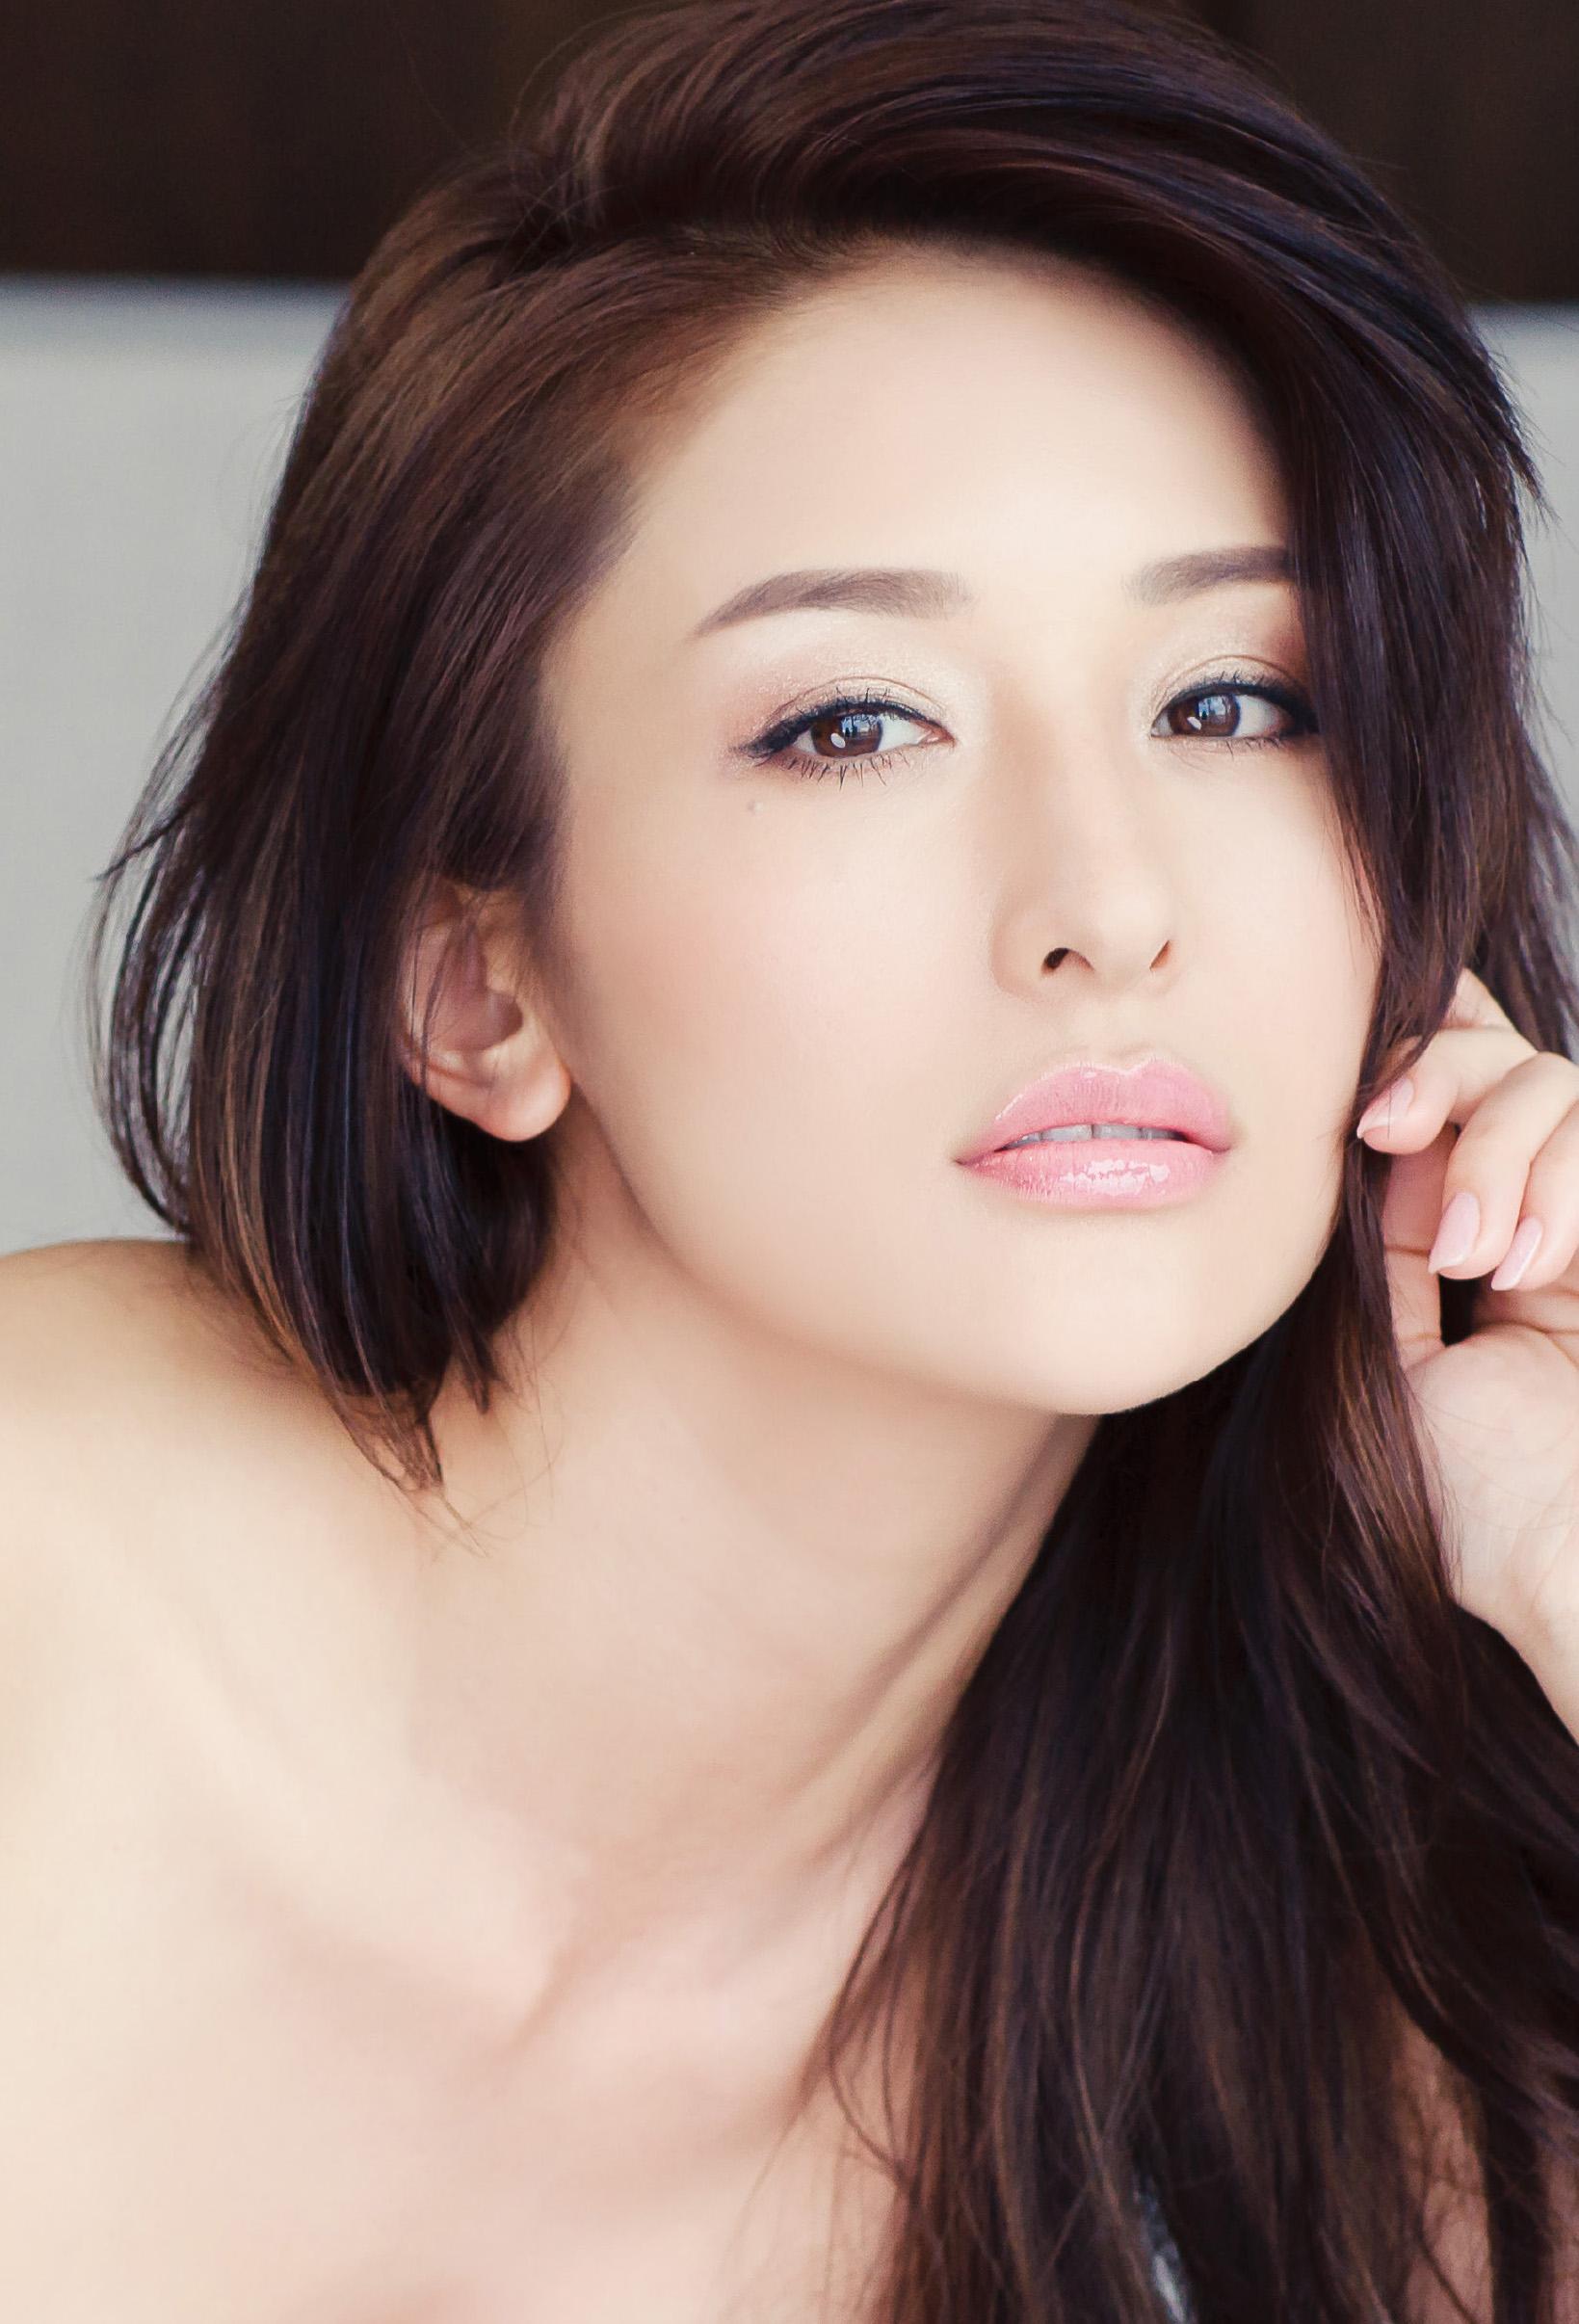 Hk girl china - 5 7